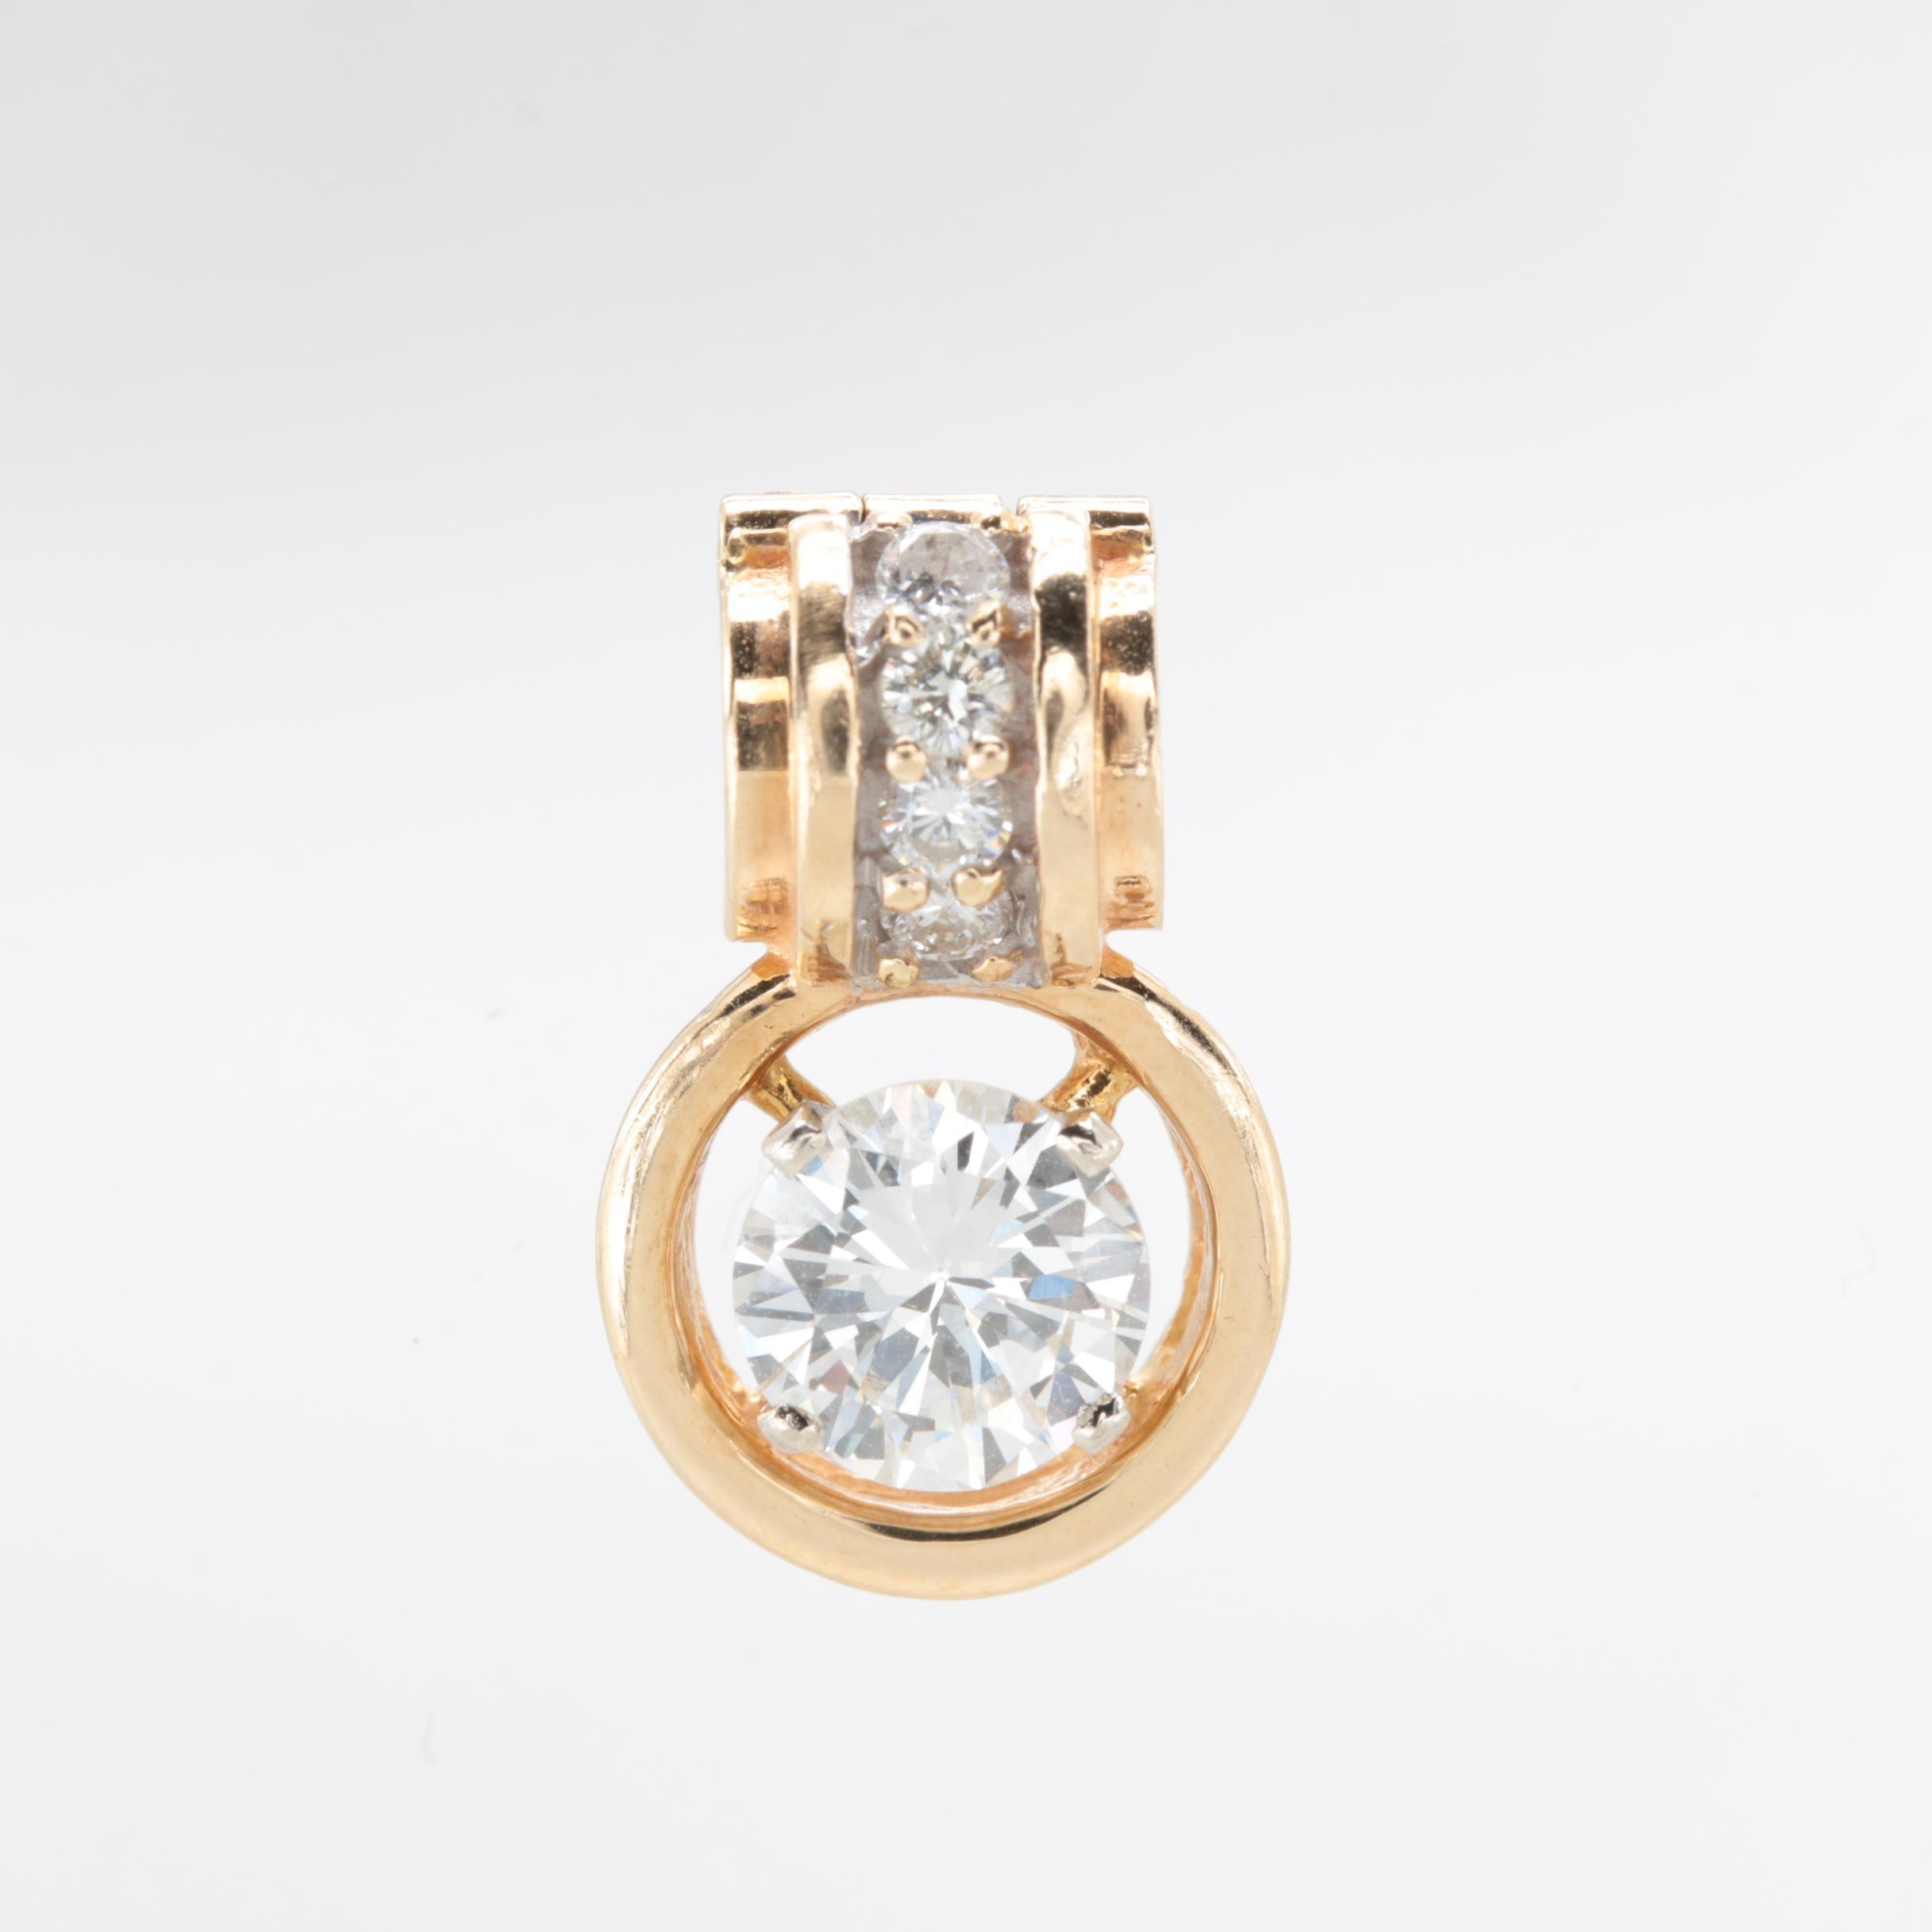 14K Yellow Gold 1.19 CTW Diamond Enhancer